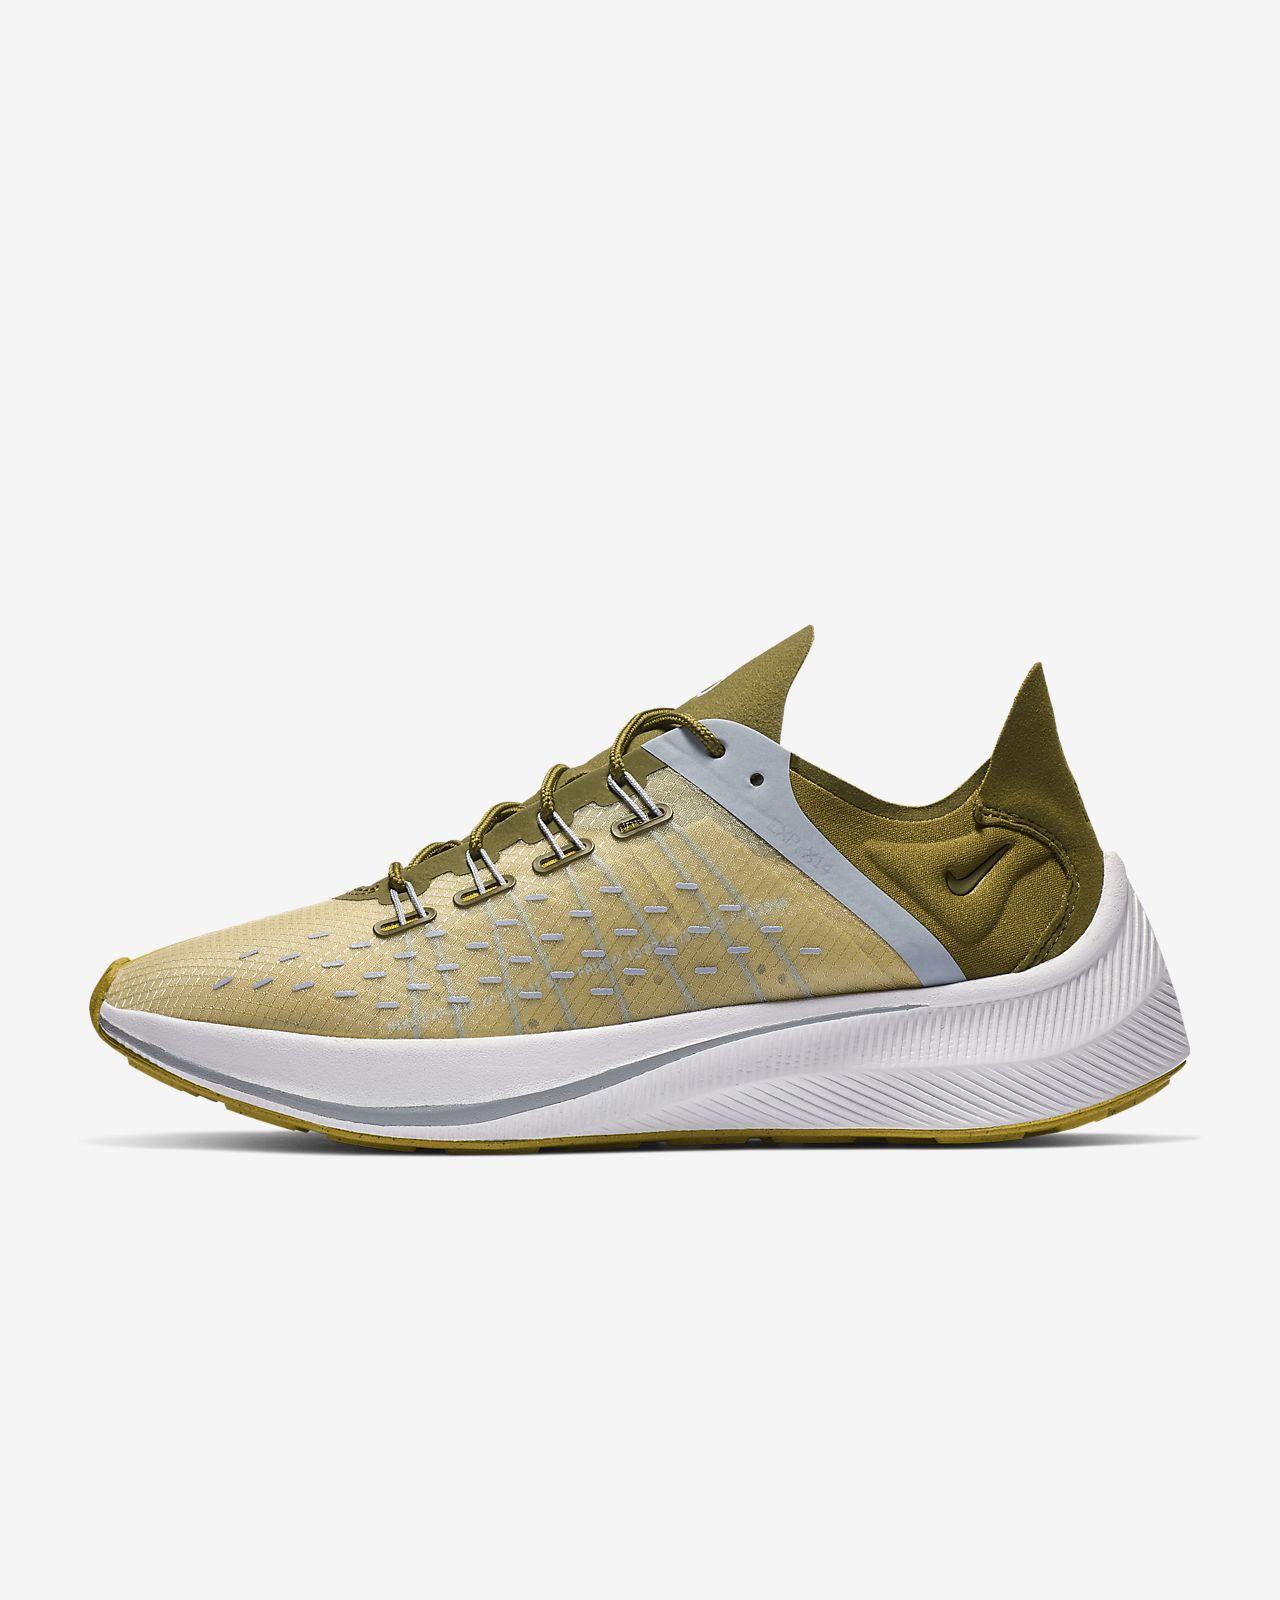 newest 1f56b e5d85 ... Nike EXP-X14 Women s Shoe